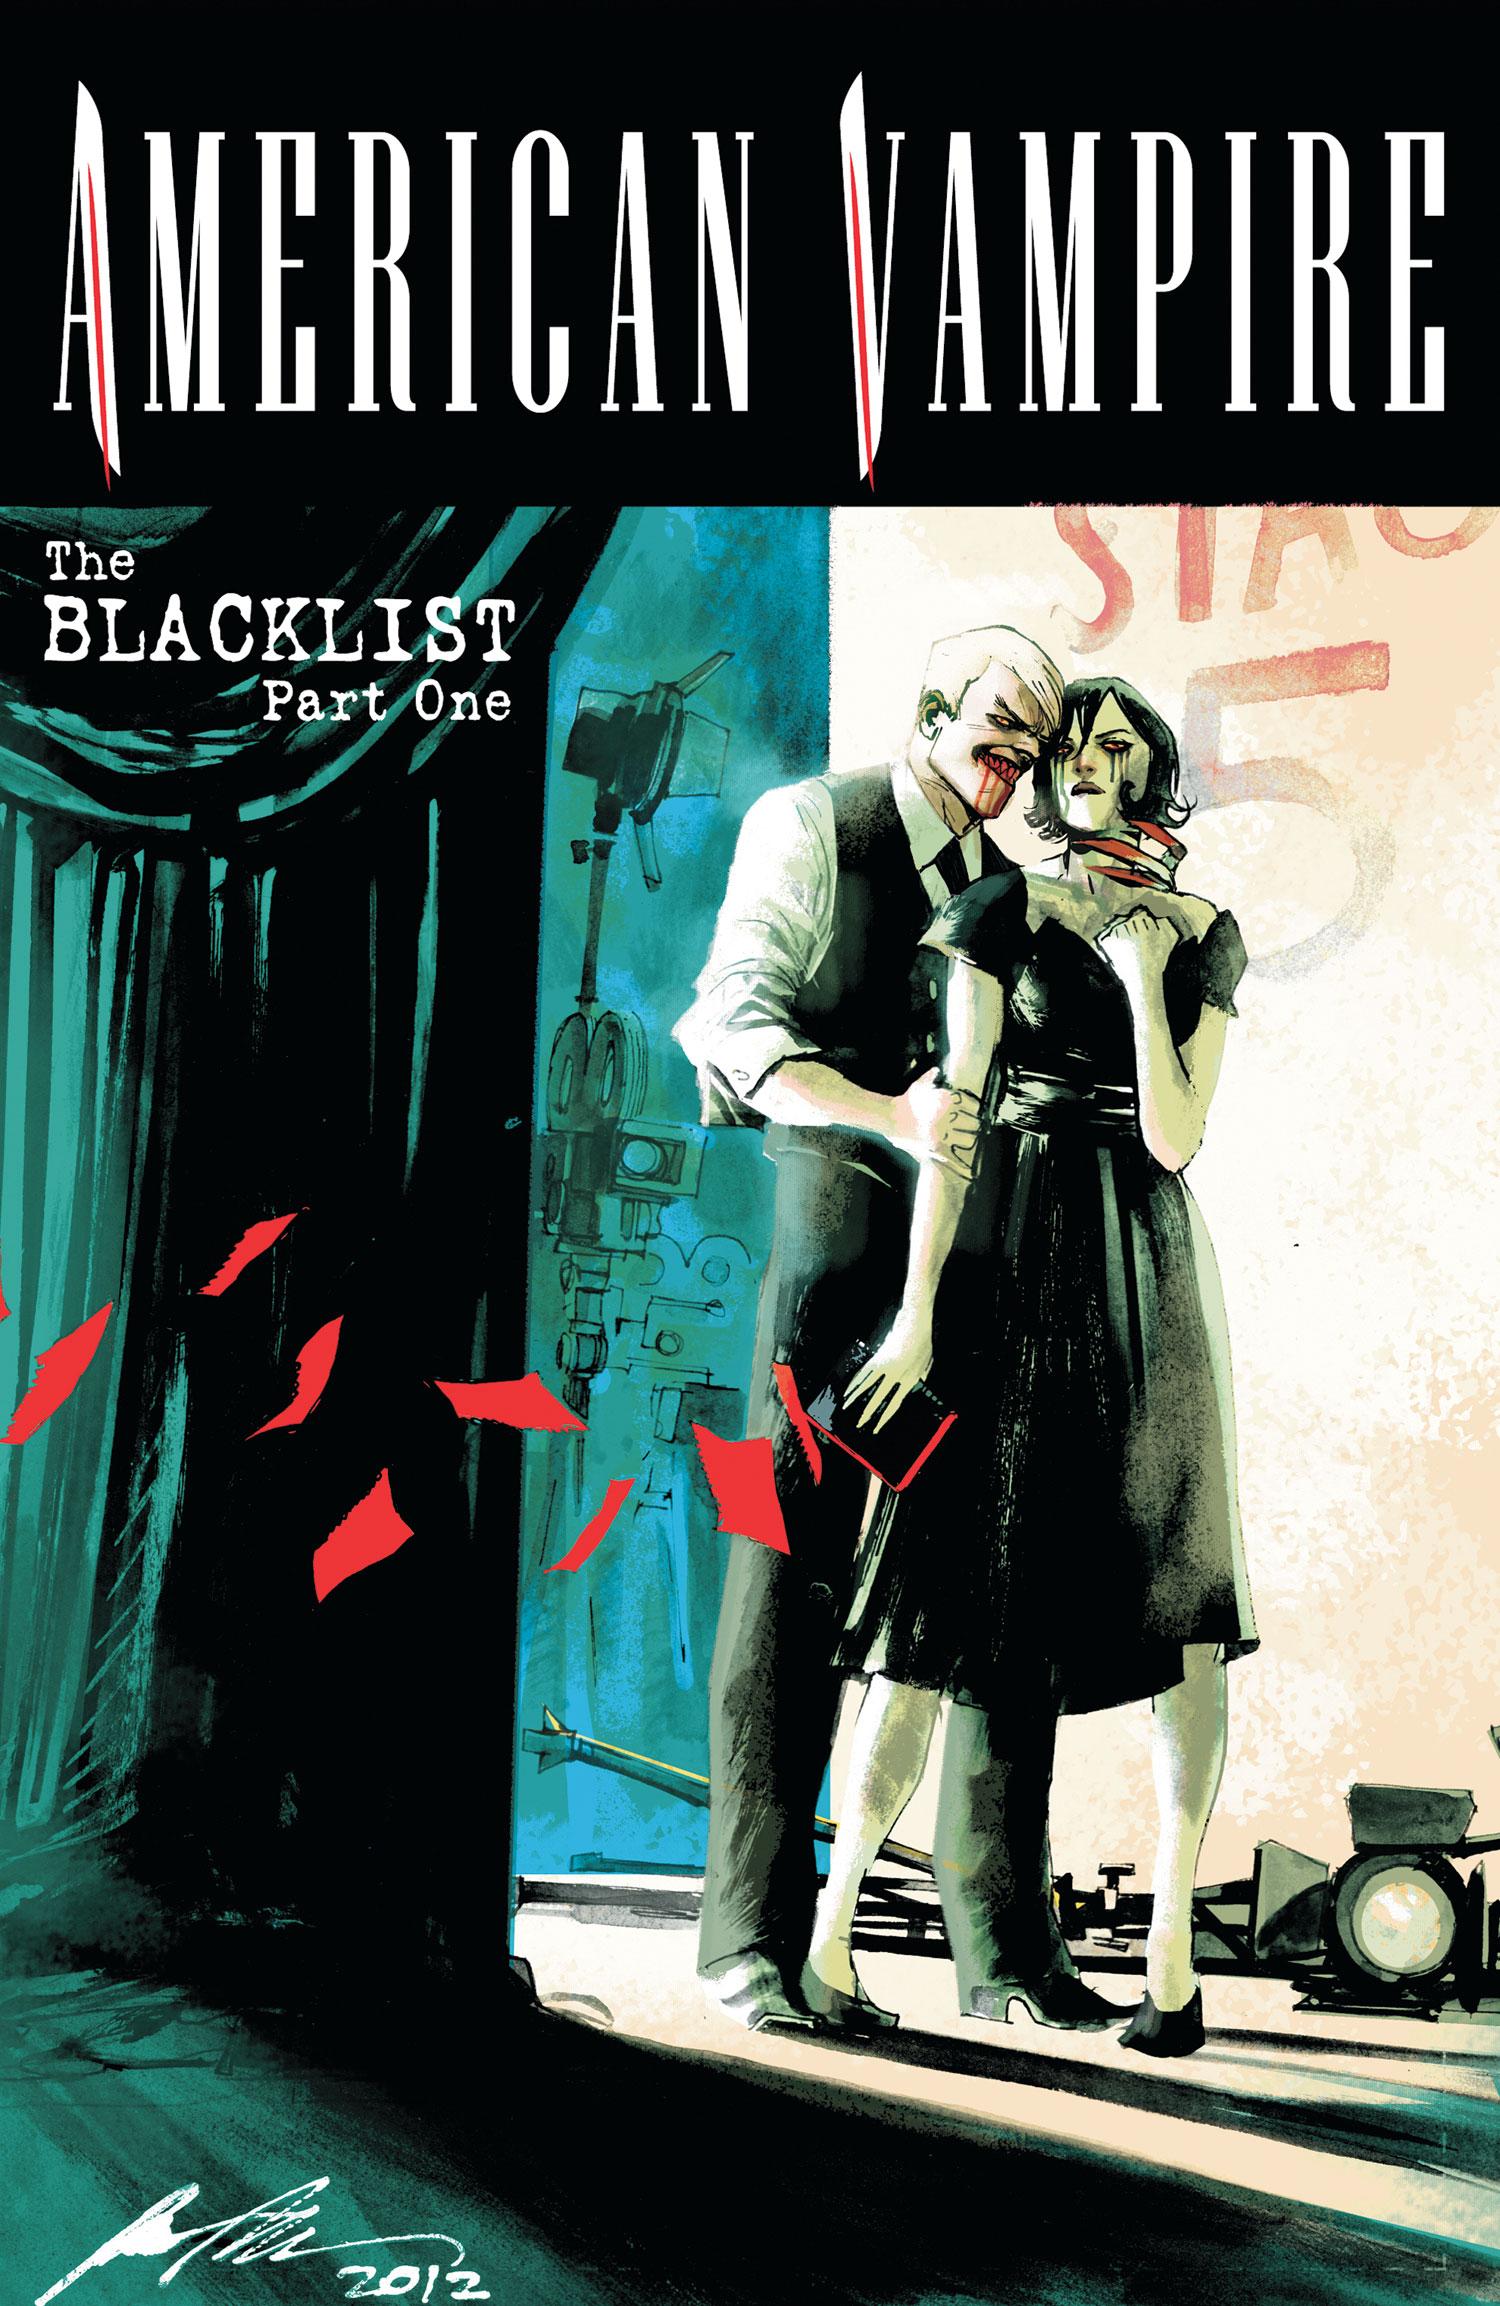 American Vampire #28 by Rafael Albuquerque